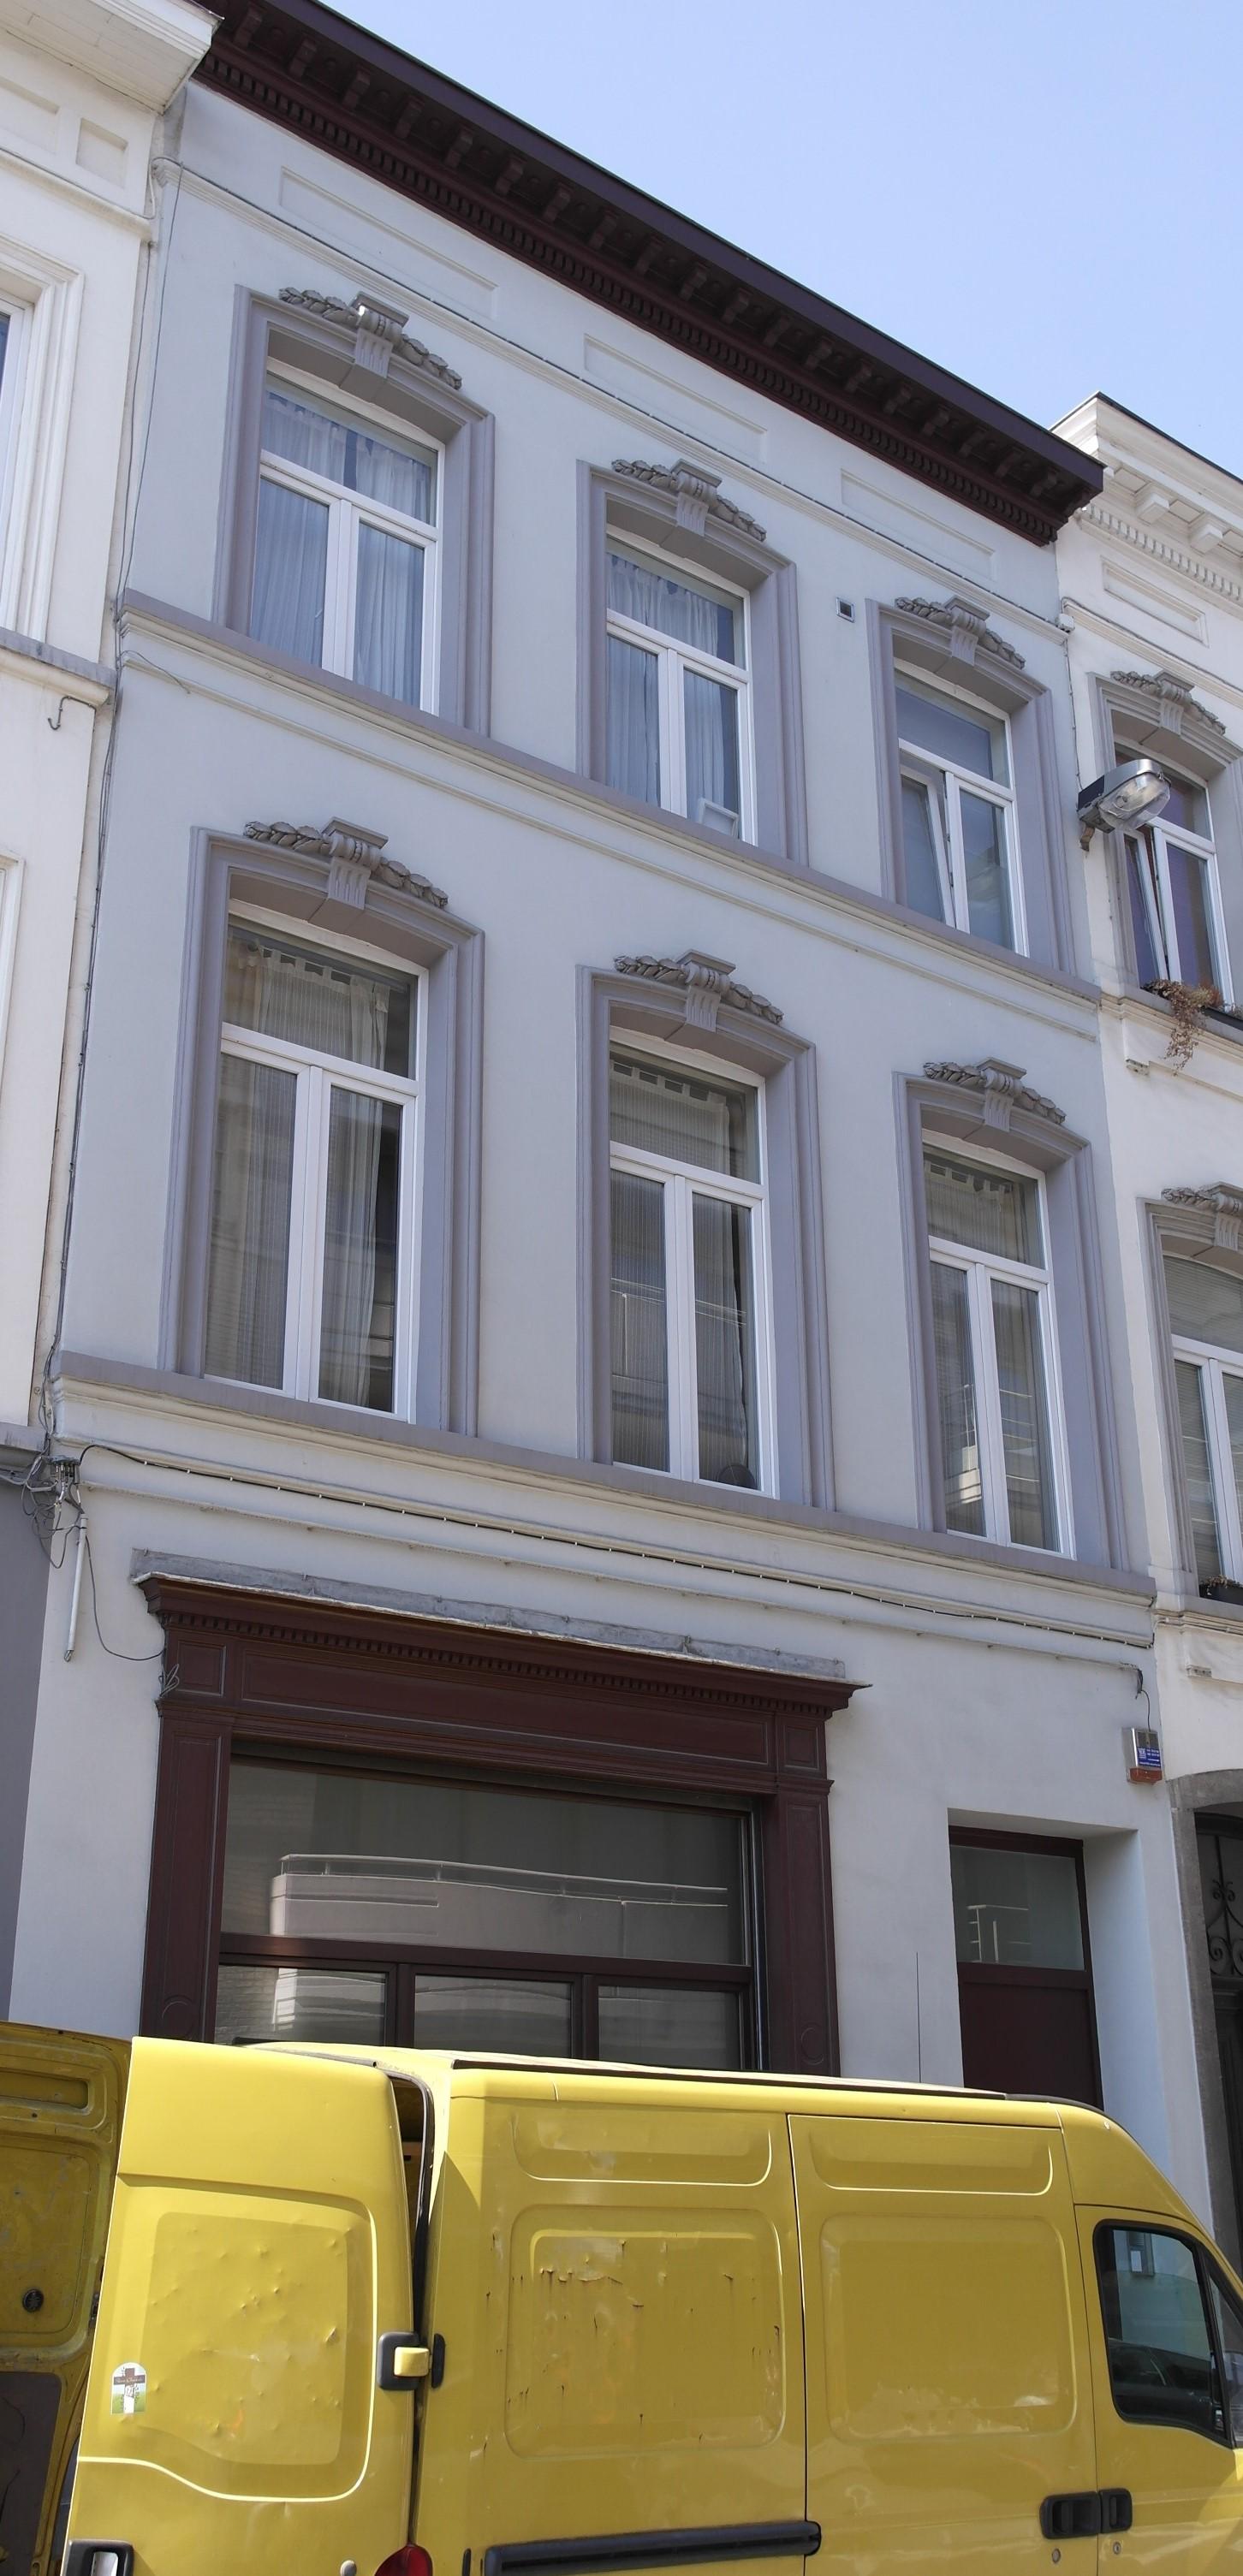 Godecharlestraat 39, 2014